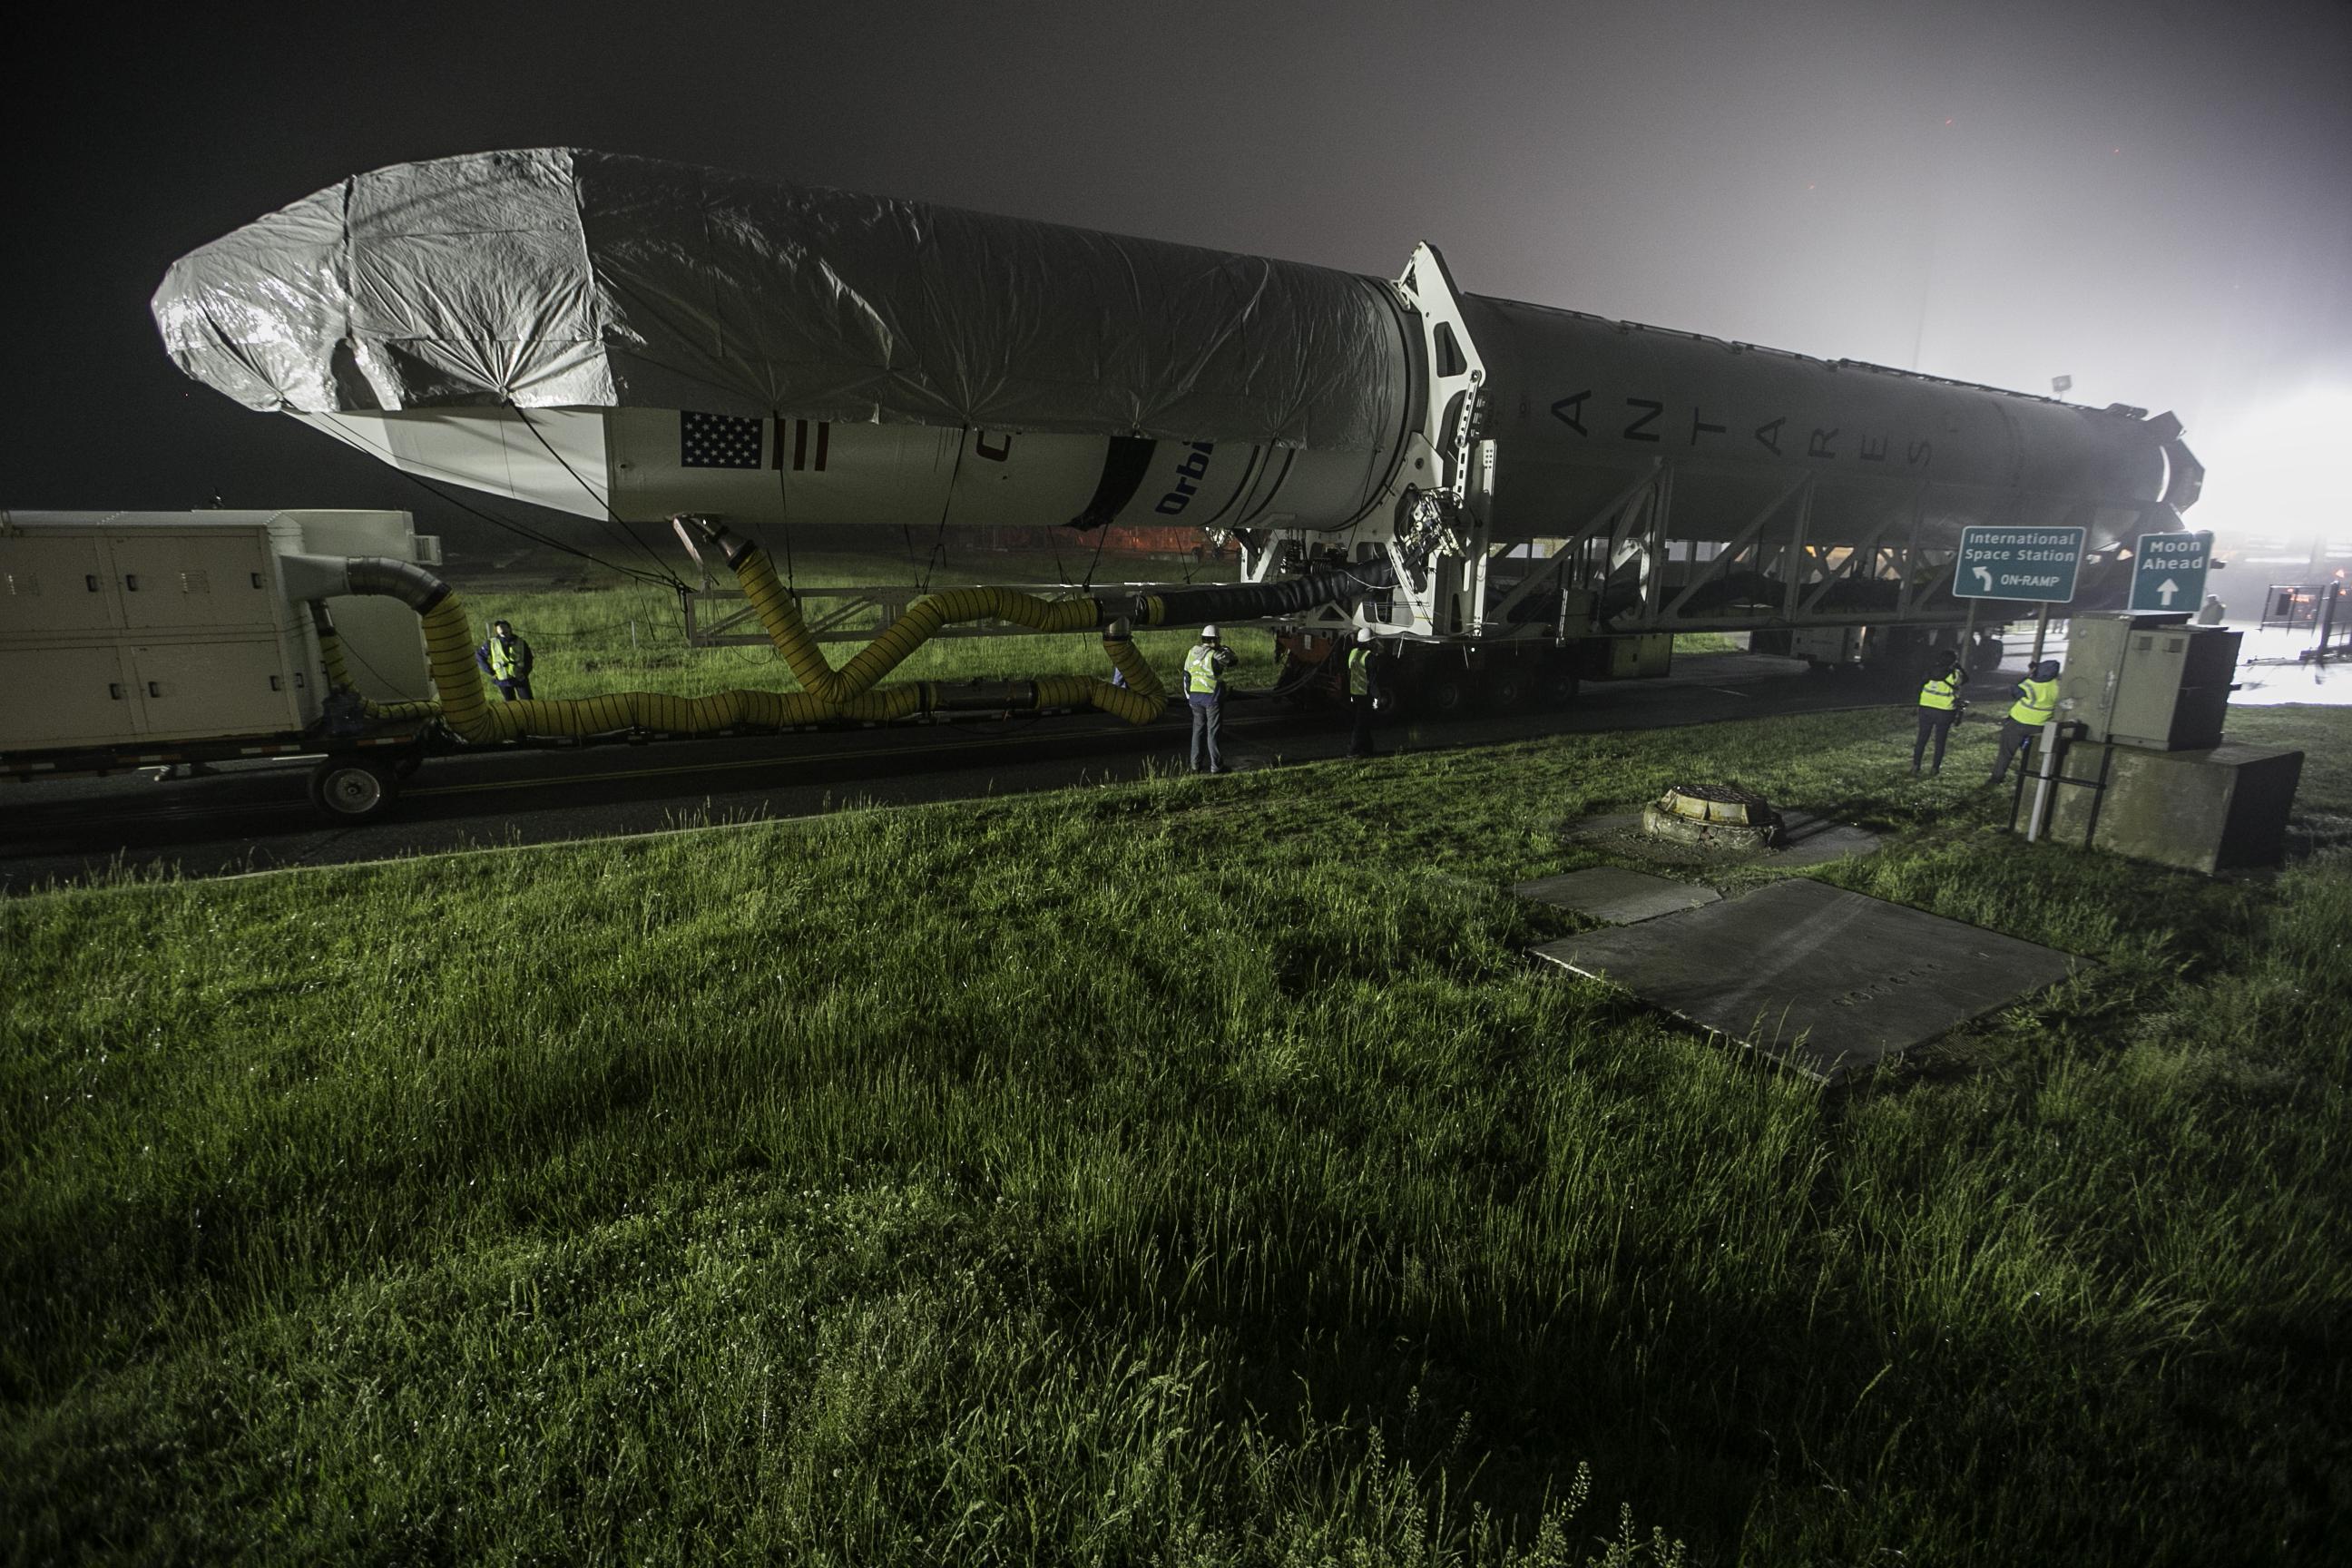 Credit NASAu0027s Wallops Flight FacilityPatrick Black